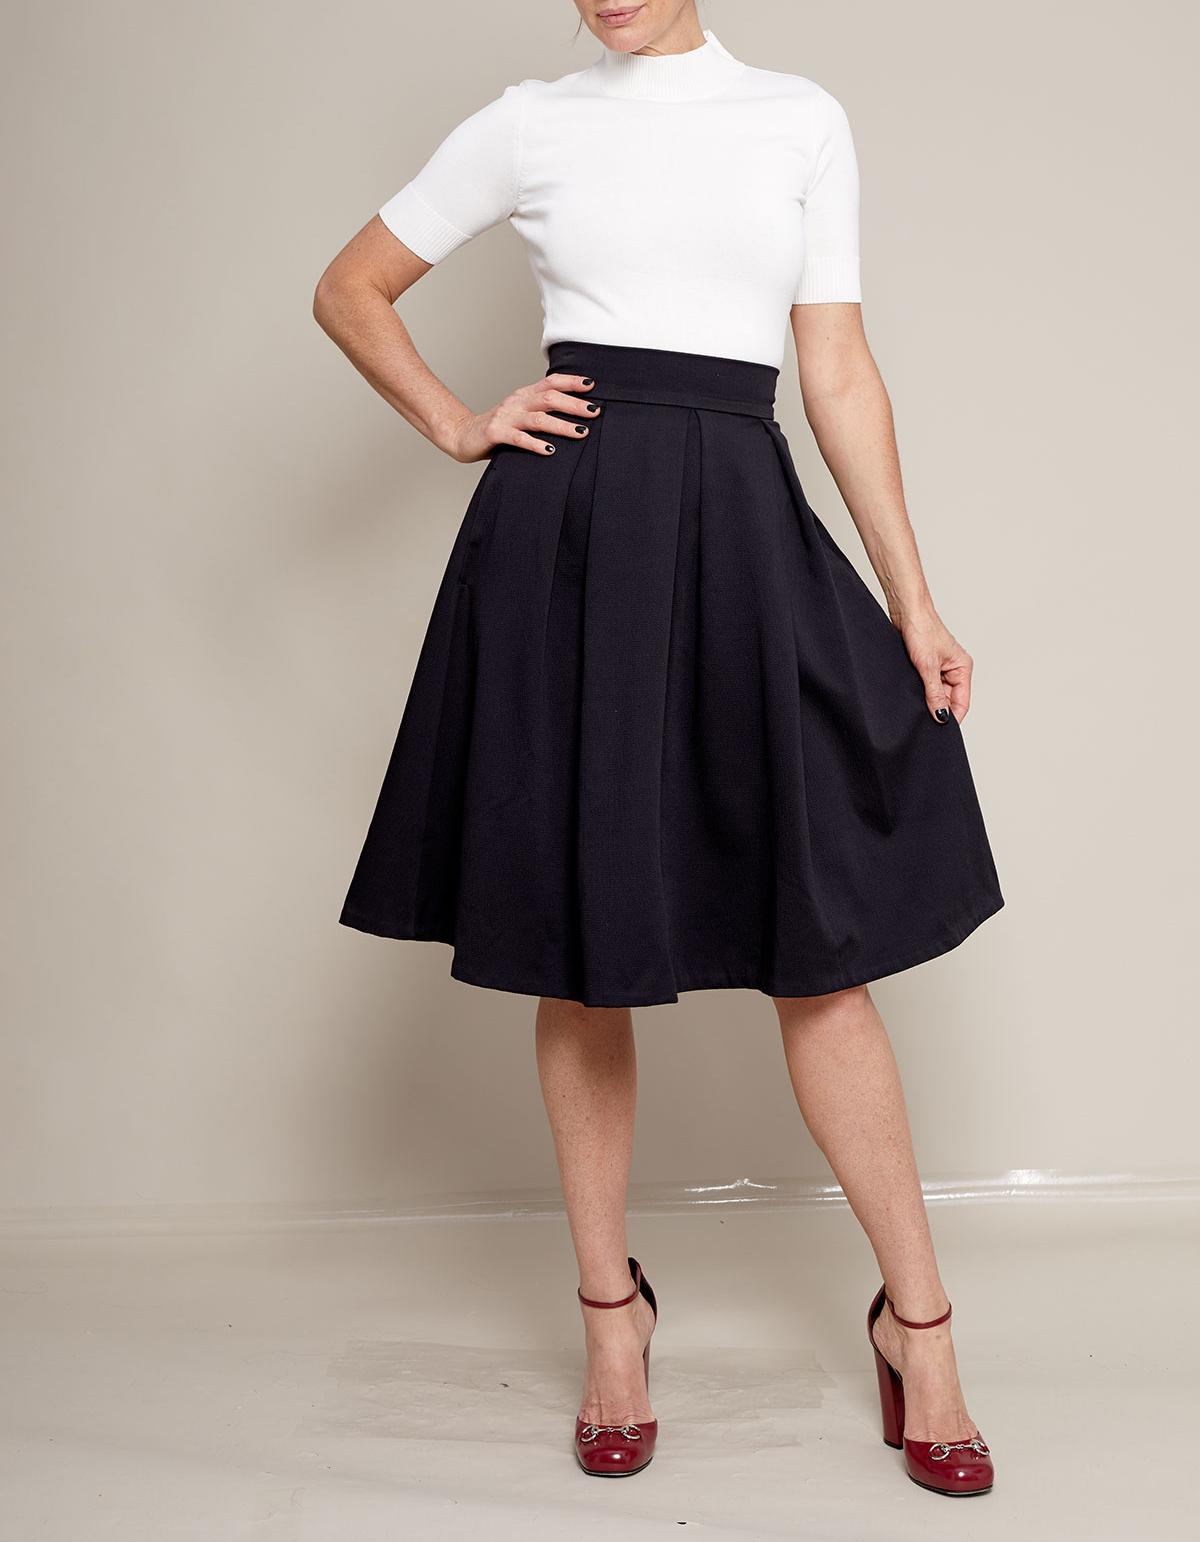 Just Patterns Stephanie Skirt 3